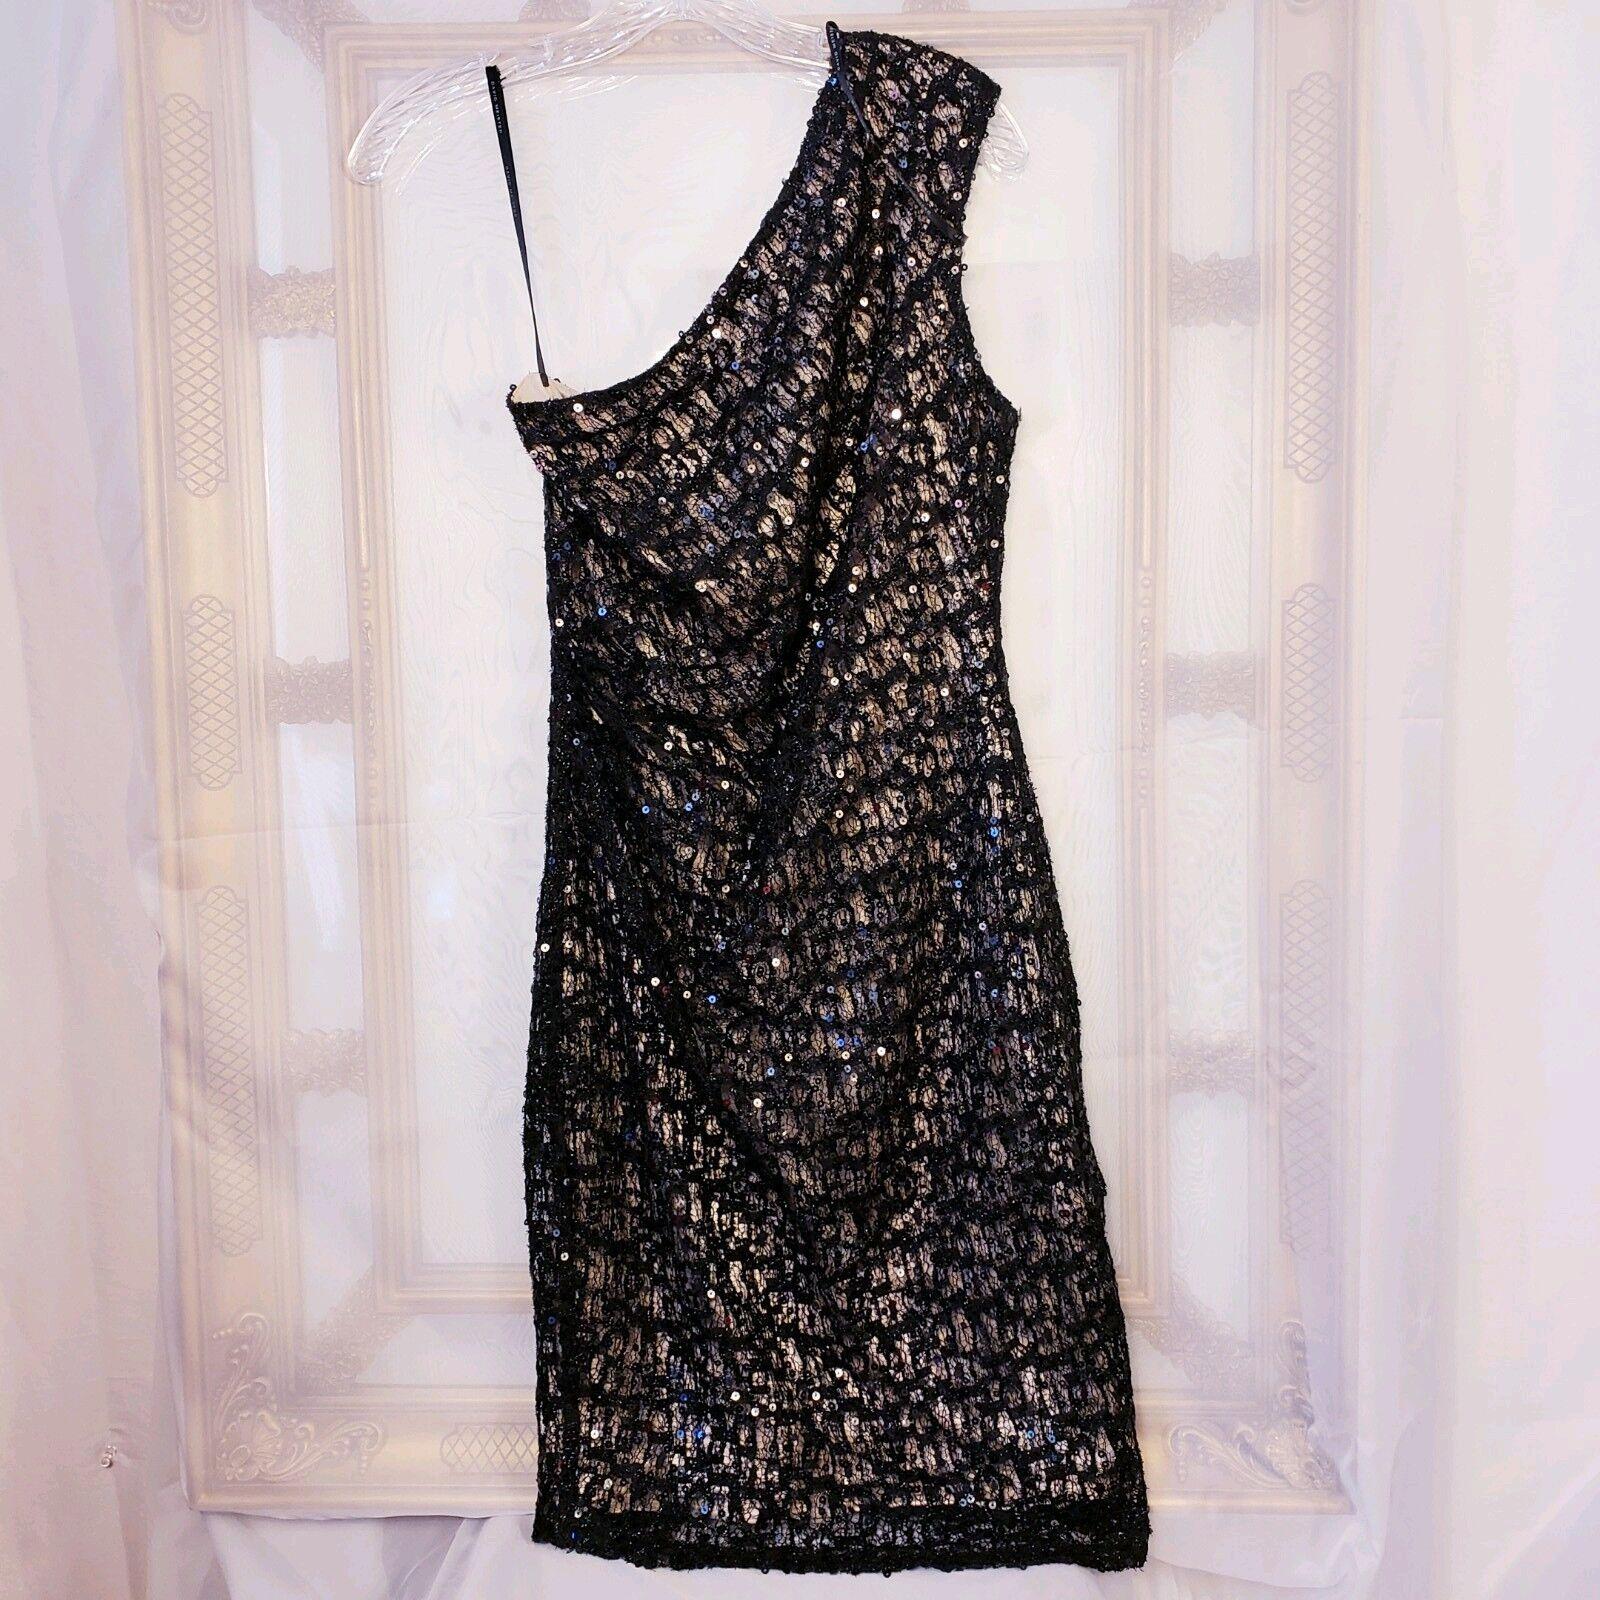 David Meister Sz 8 schwarz Sequin Lace Overlay One Shoulder Party Dress